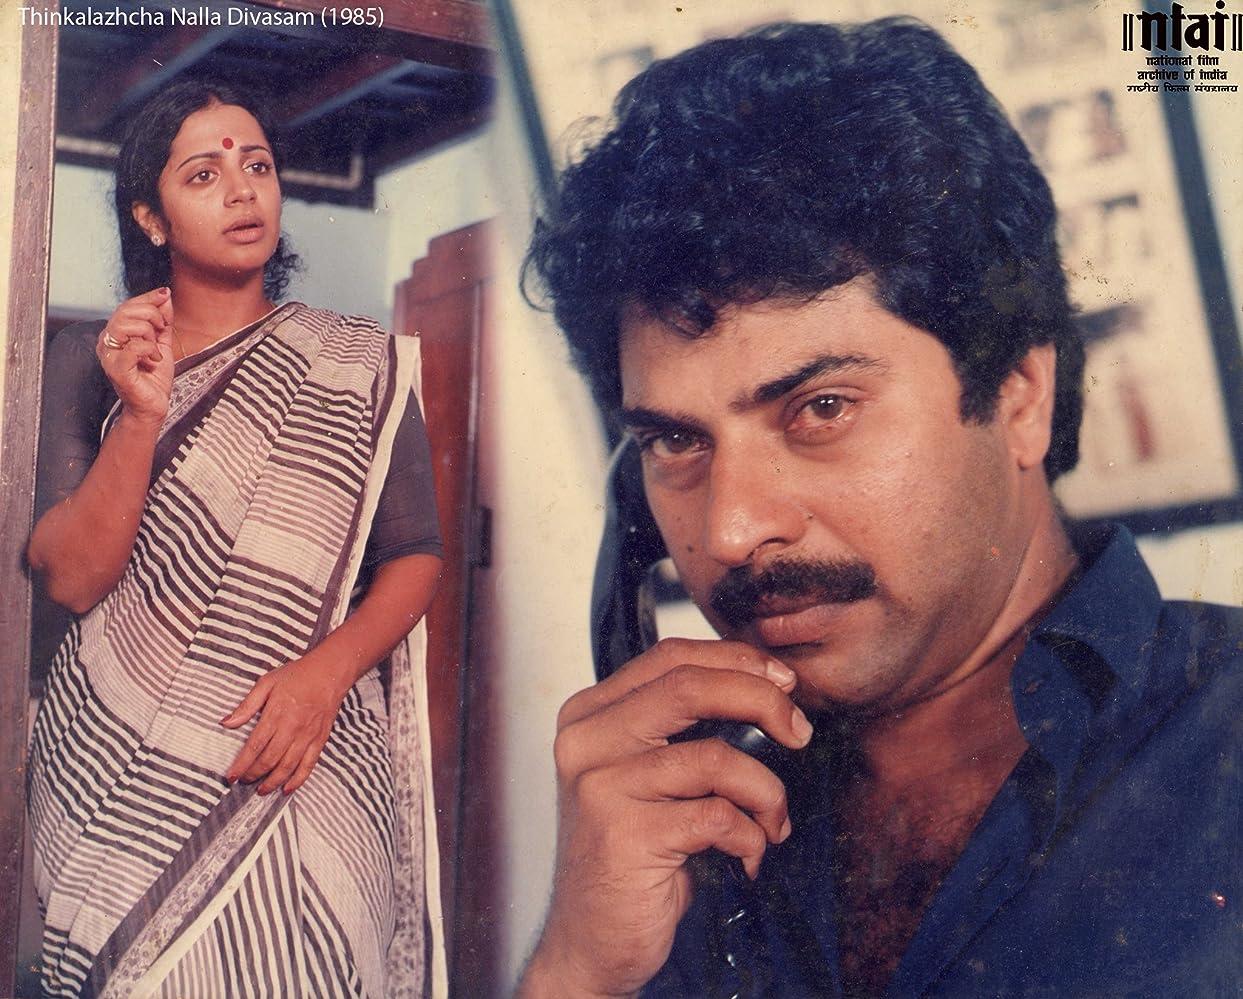 Thinkalazhcha Nalla Divasam (1985)